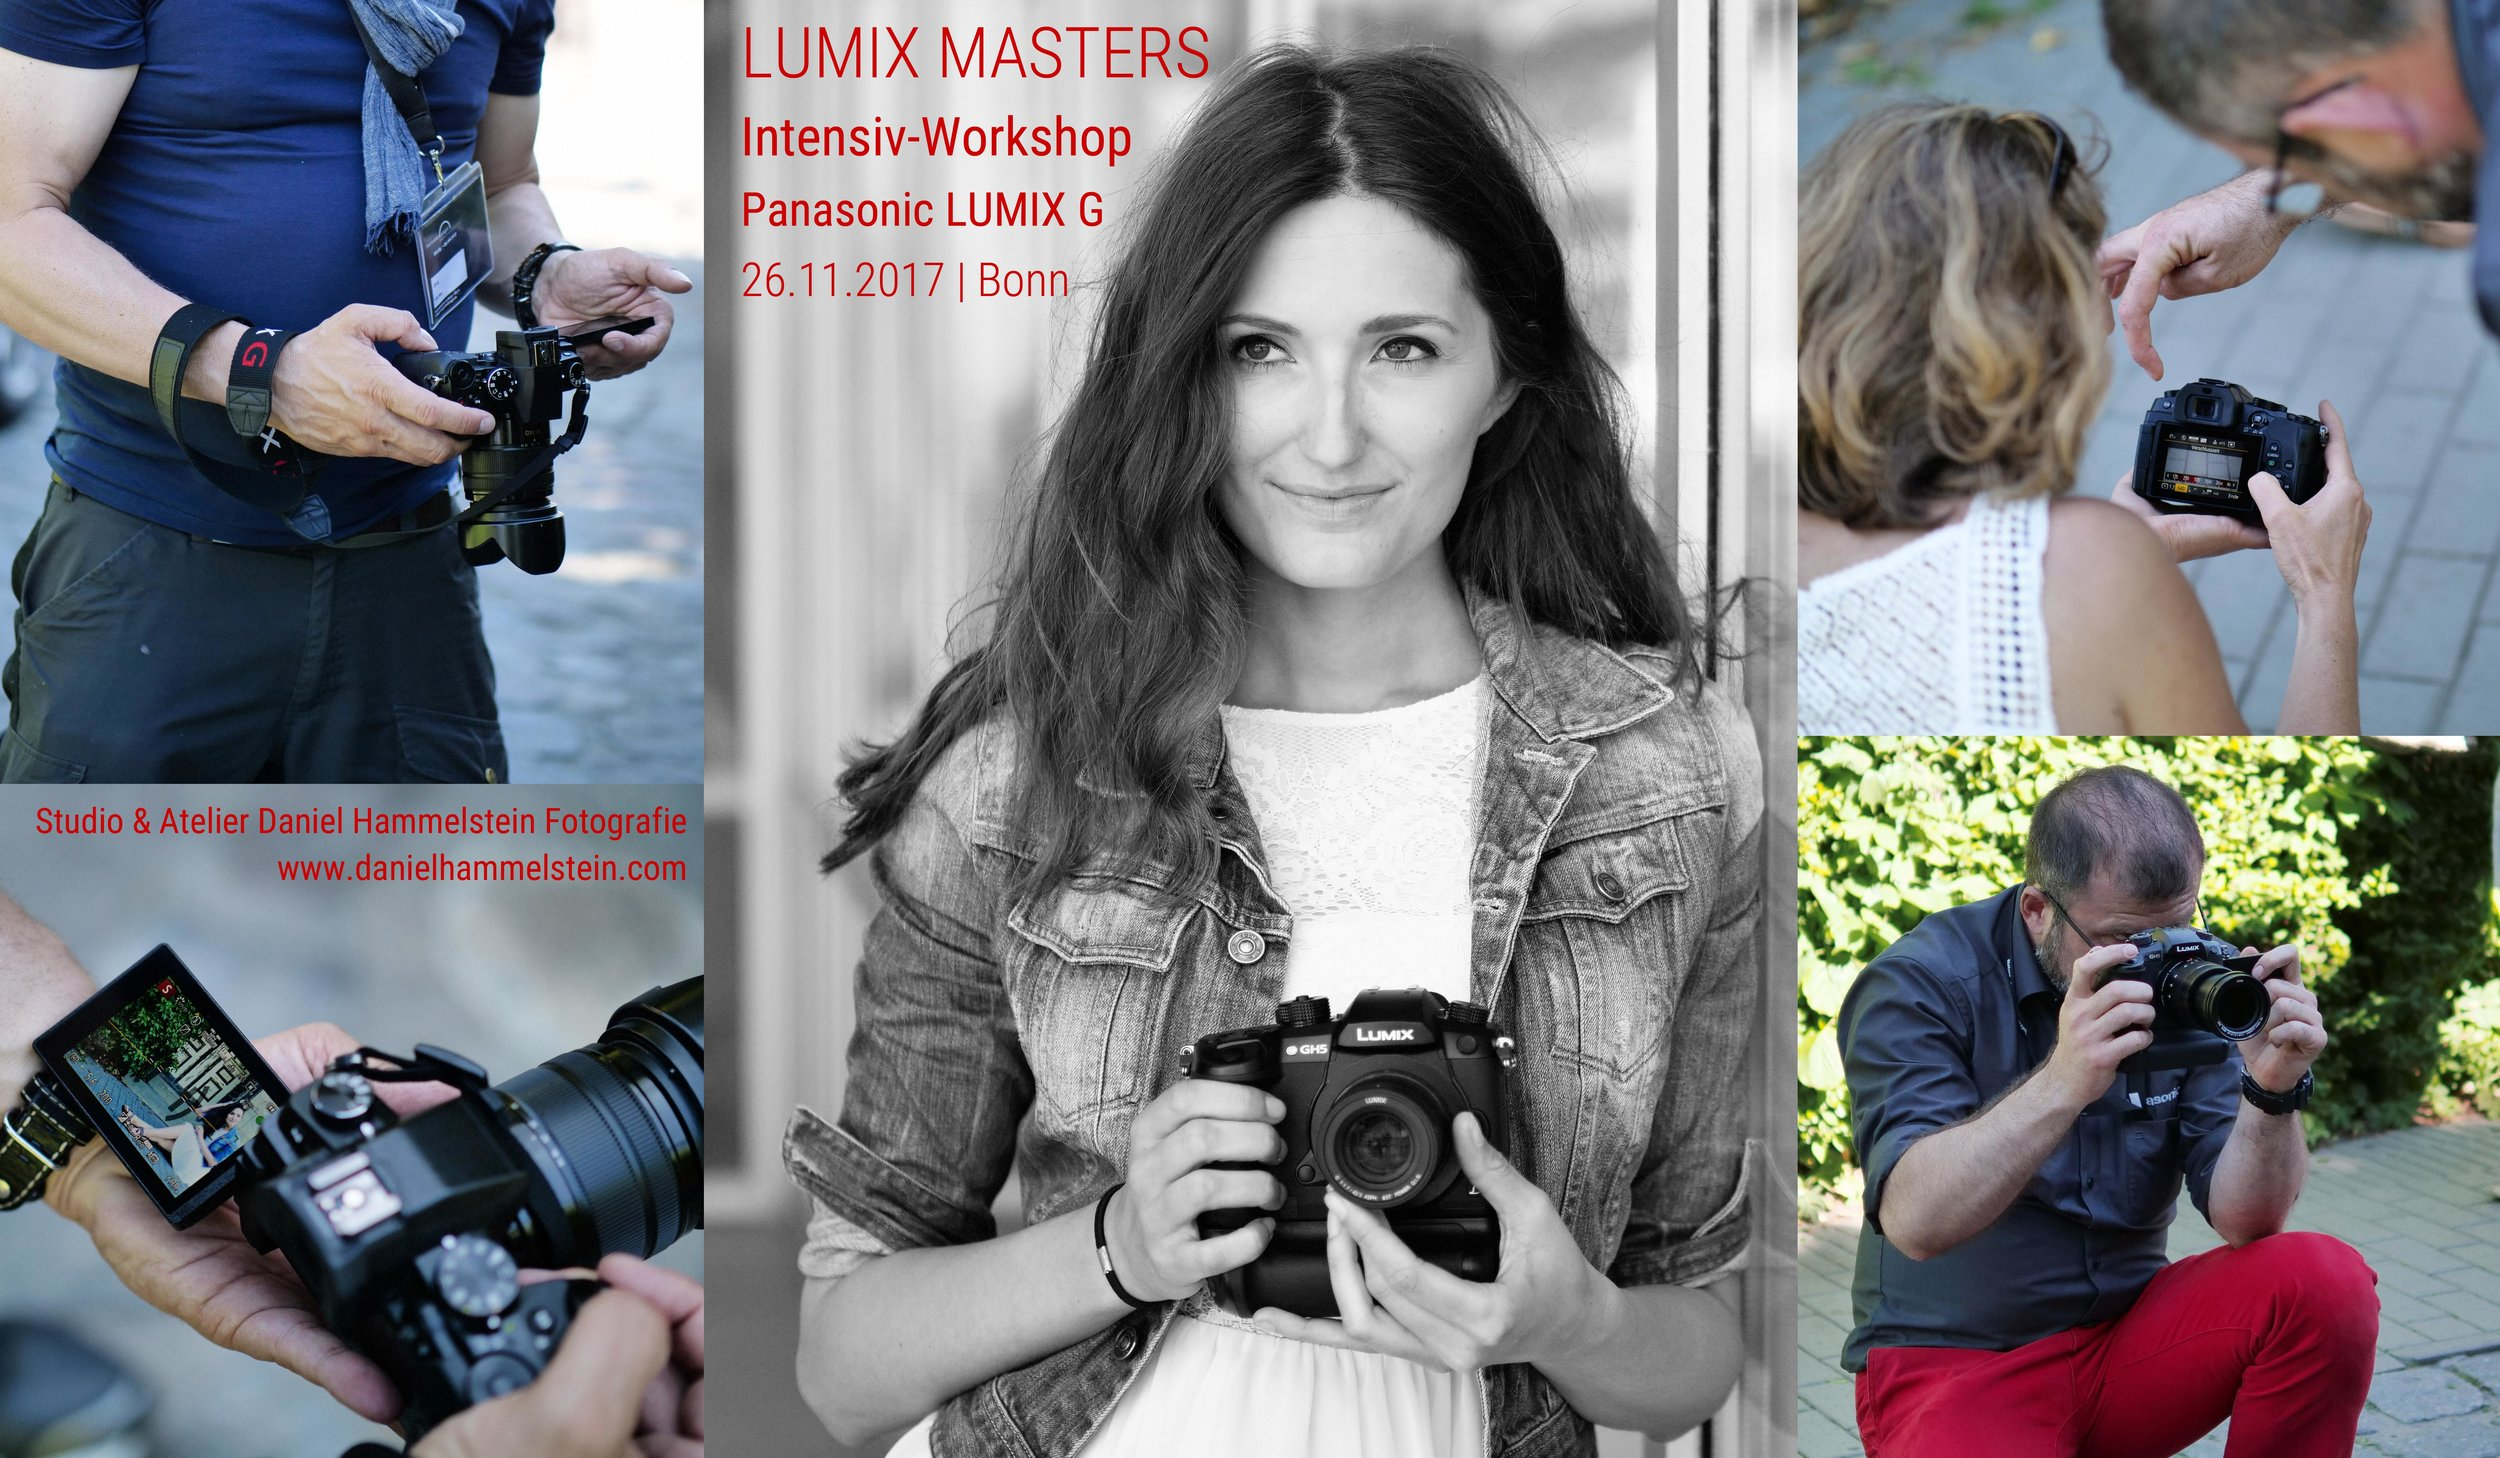 Workshop Portraitfotografie Fotoworkshop Fotokurs Bonn Köln NRW Panasonic Lumix G Systemkamera.jpg